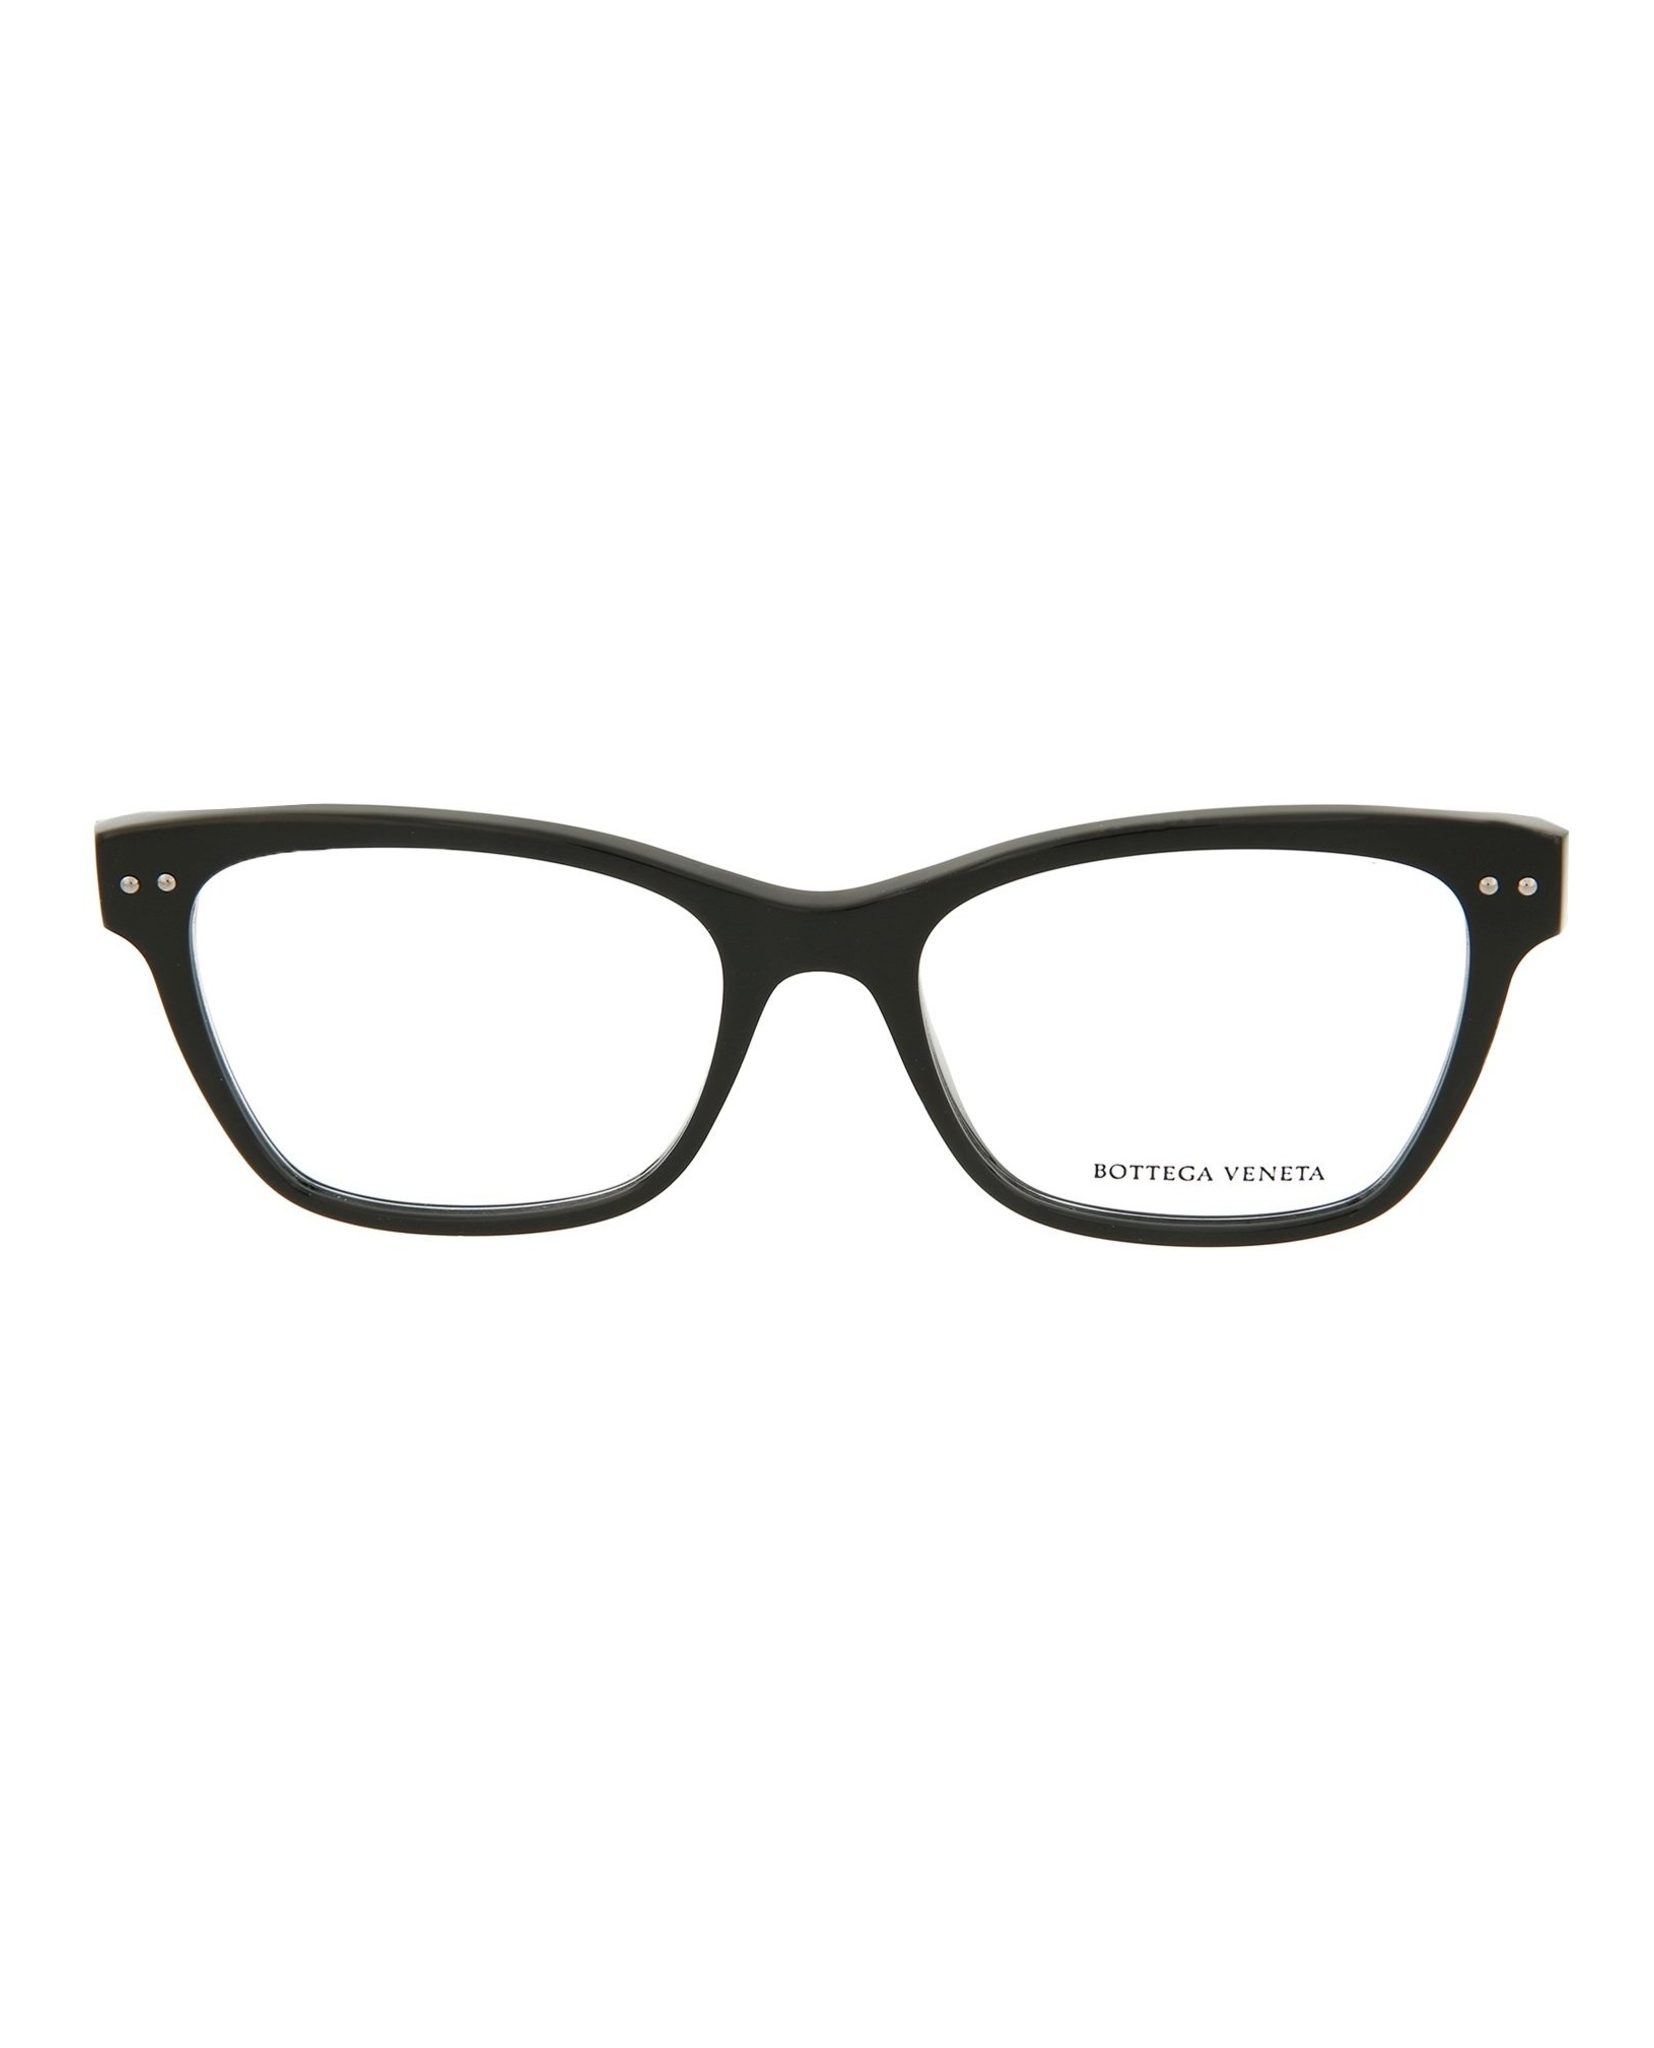 94ea734f9b4 Bottega Veneta Womens Cat Eye Optical Frames BV0016O-30000115-001 ...